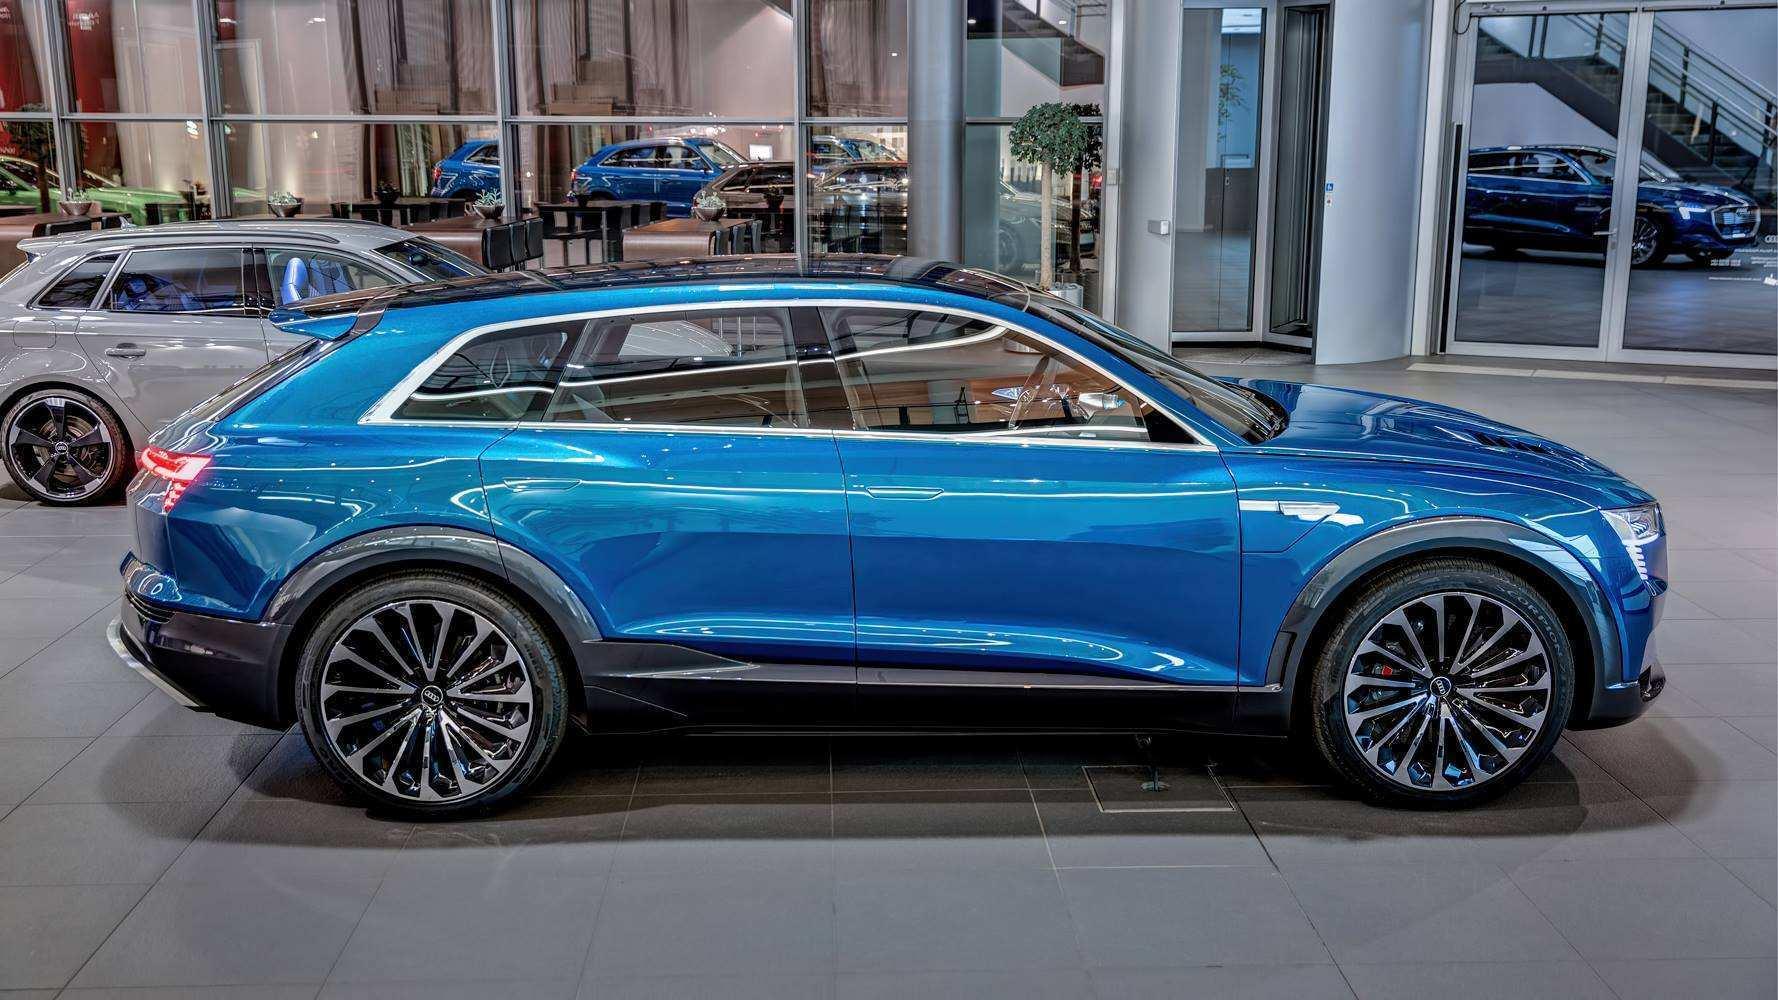 83 Gallery of Audi E Tron 2020 Specs by Audi E Tron 2020